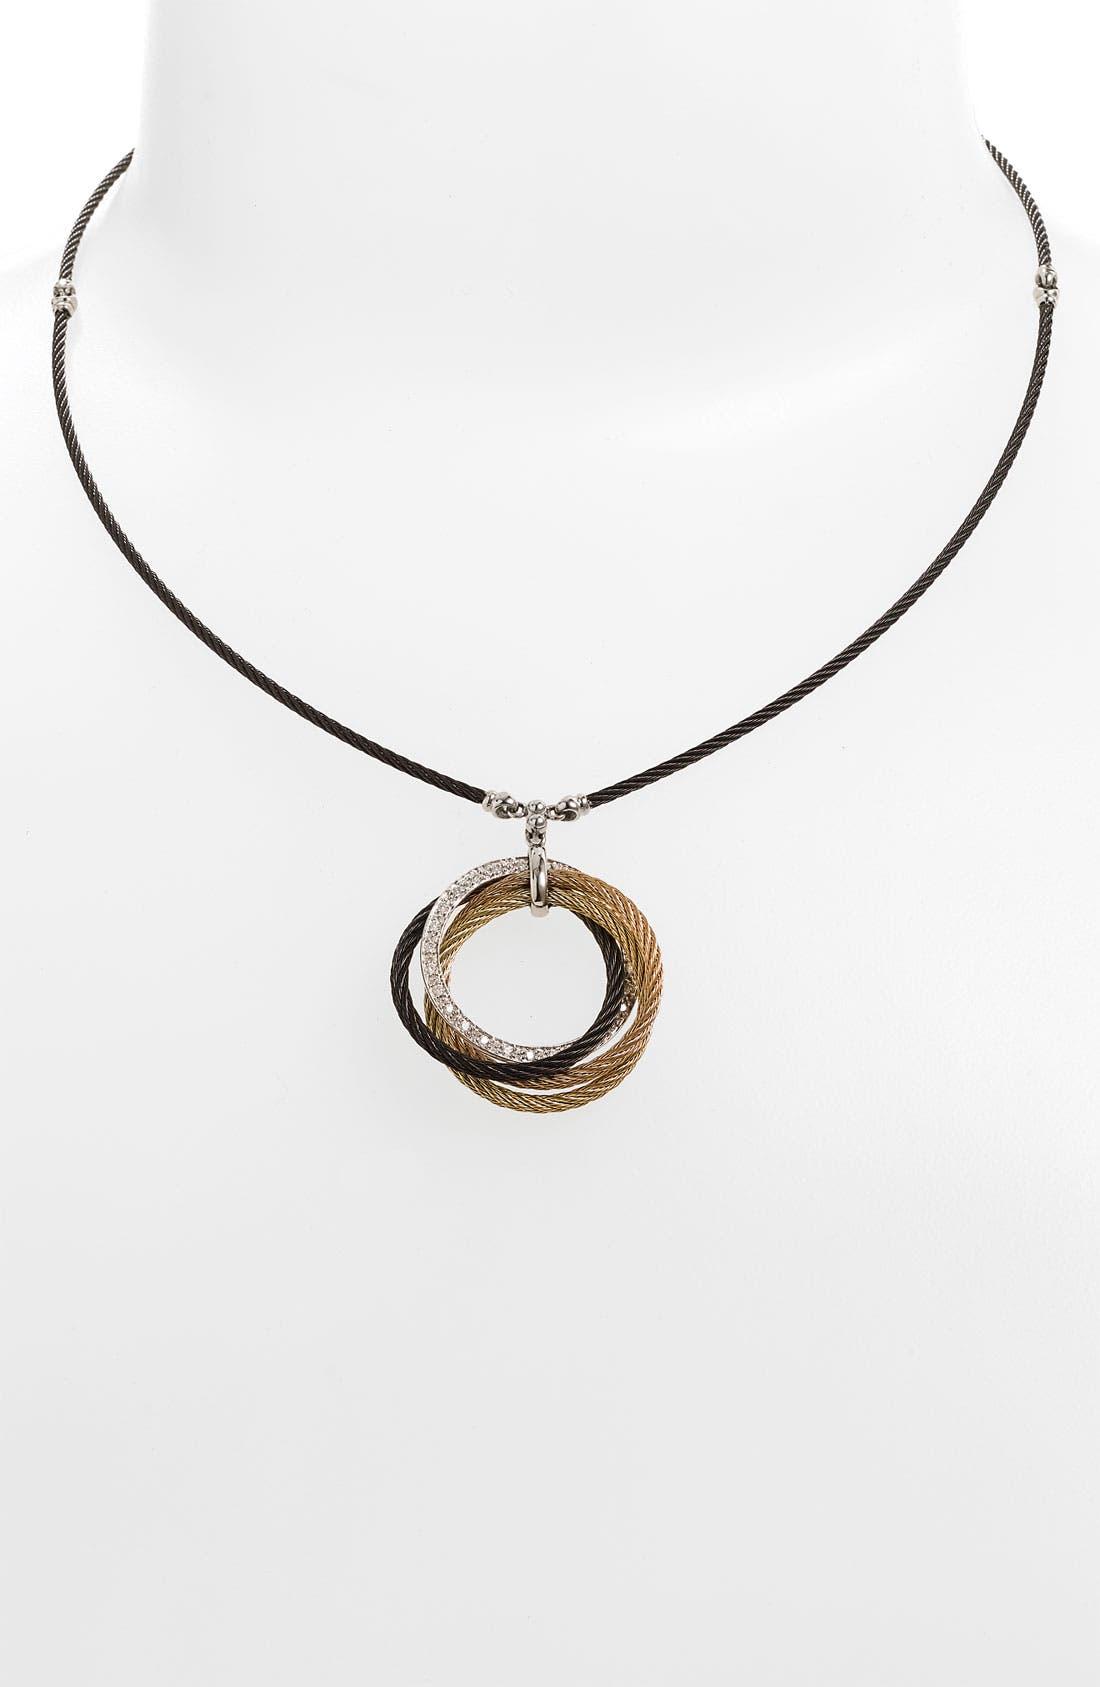 Alternate Image 1 Selected - ALOR® Interlocked Cable Diamond Pendant Necklace